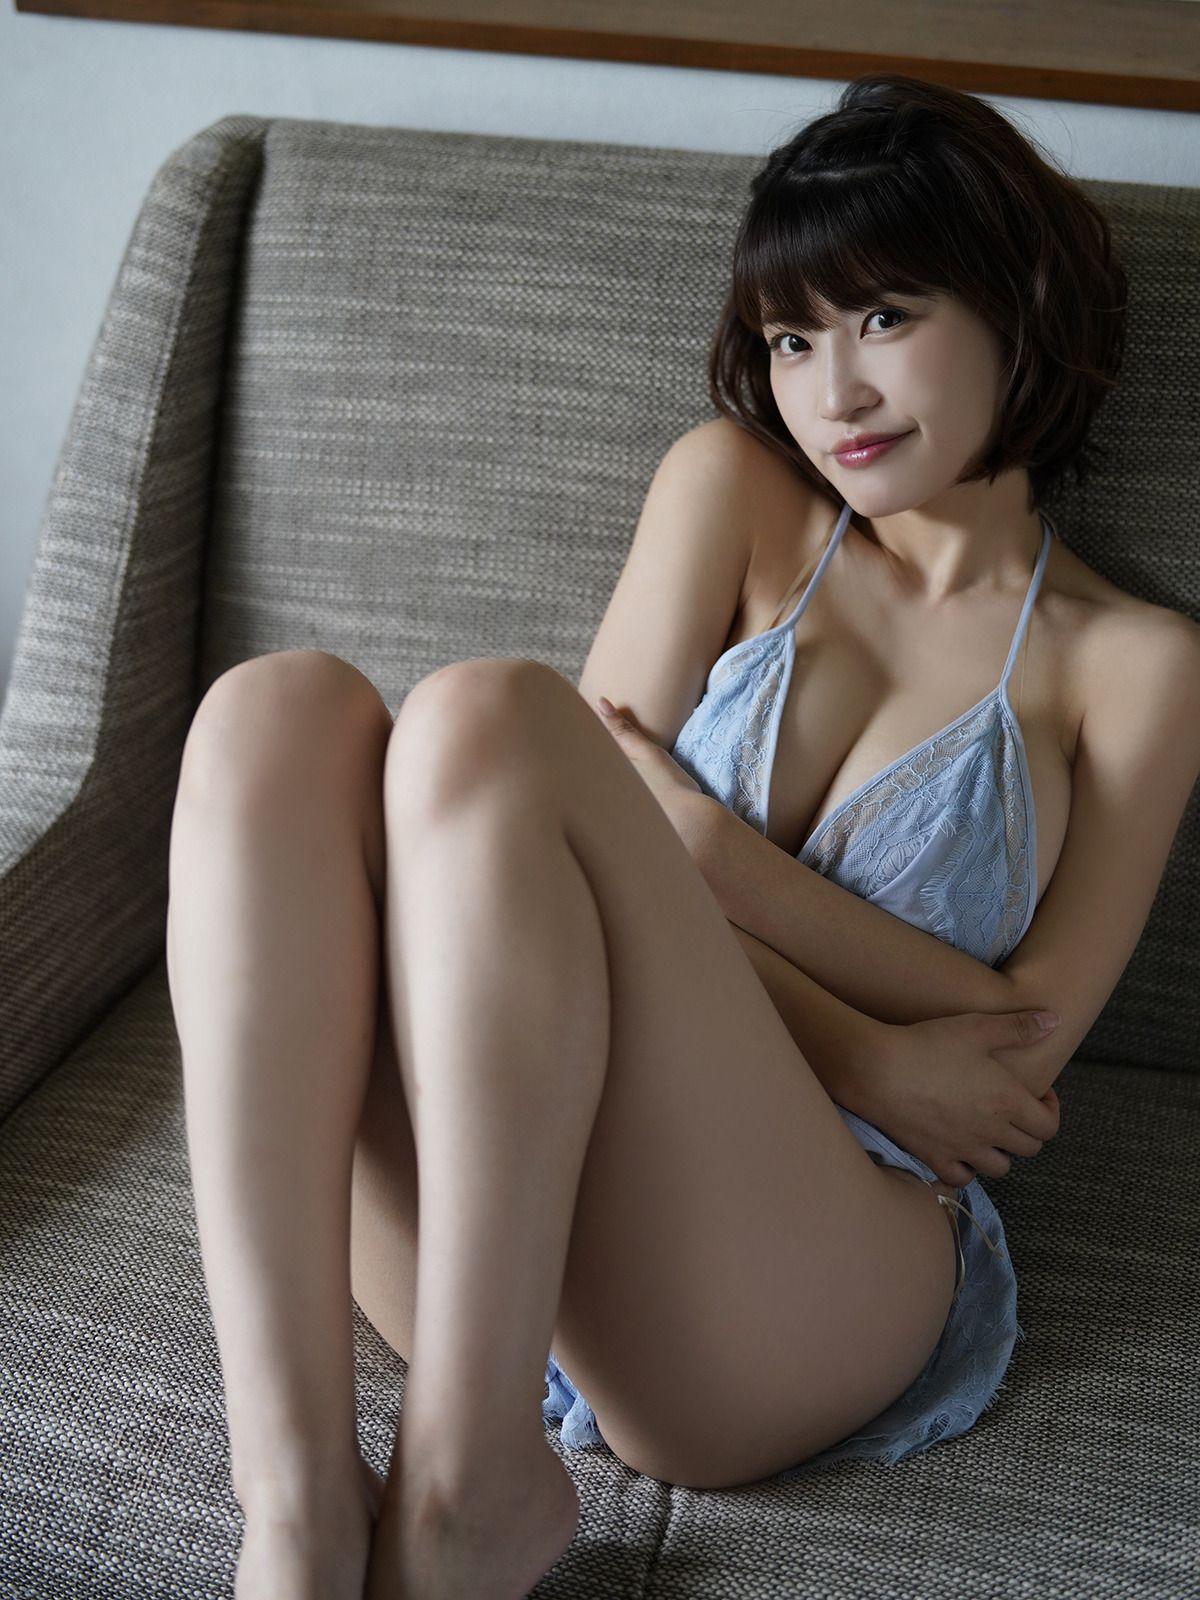 [Sabra.net] 岸明日香『真夏のGパイSHOCK 2』 写真套图